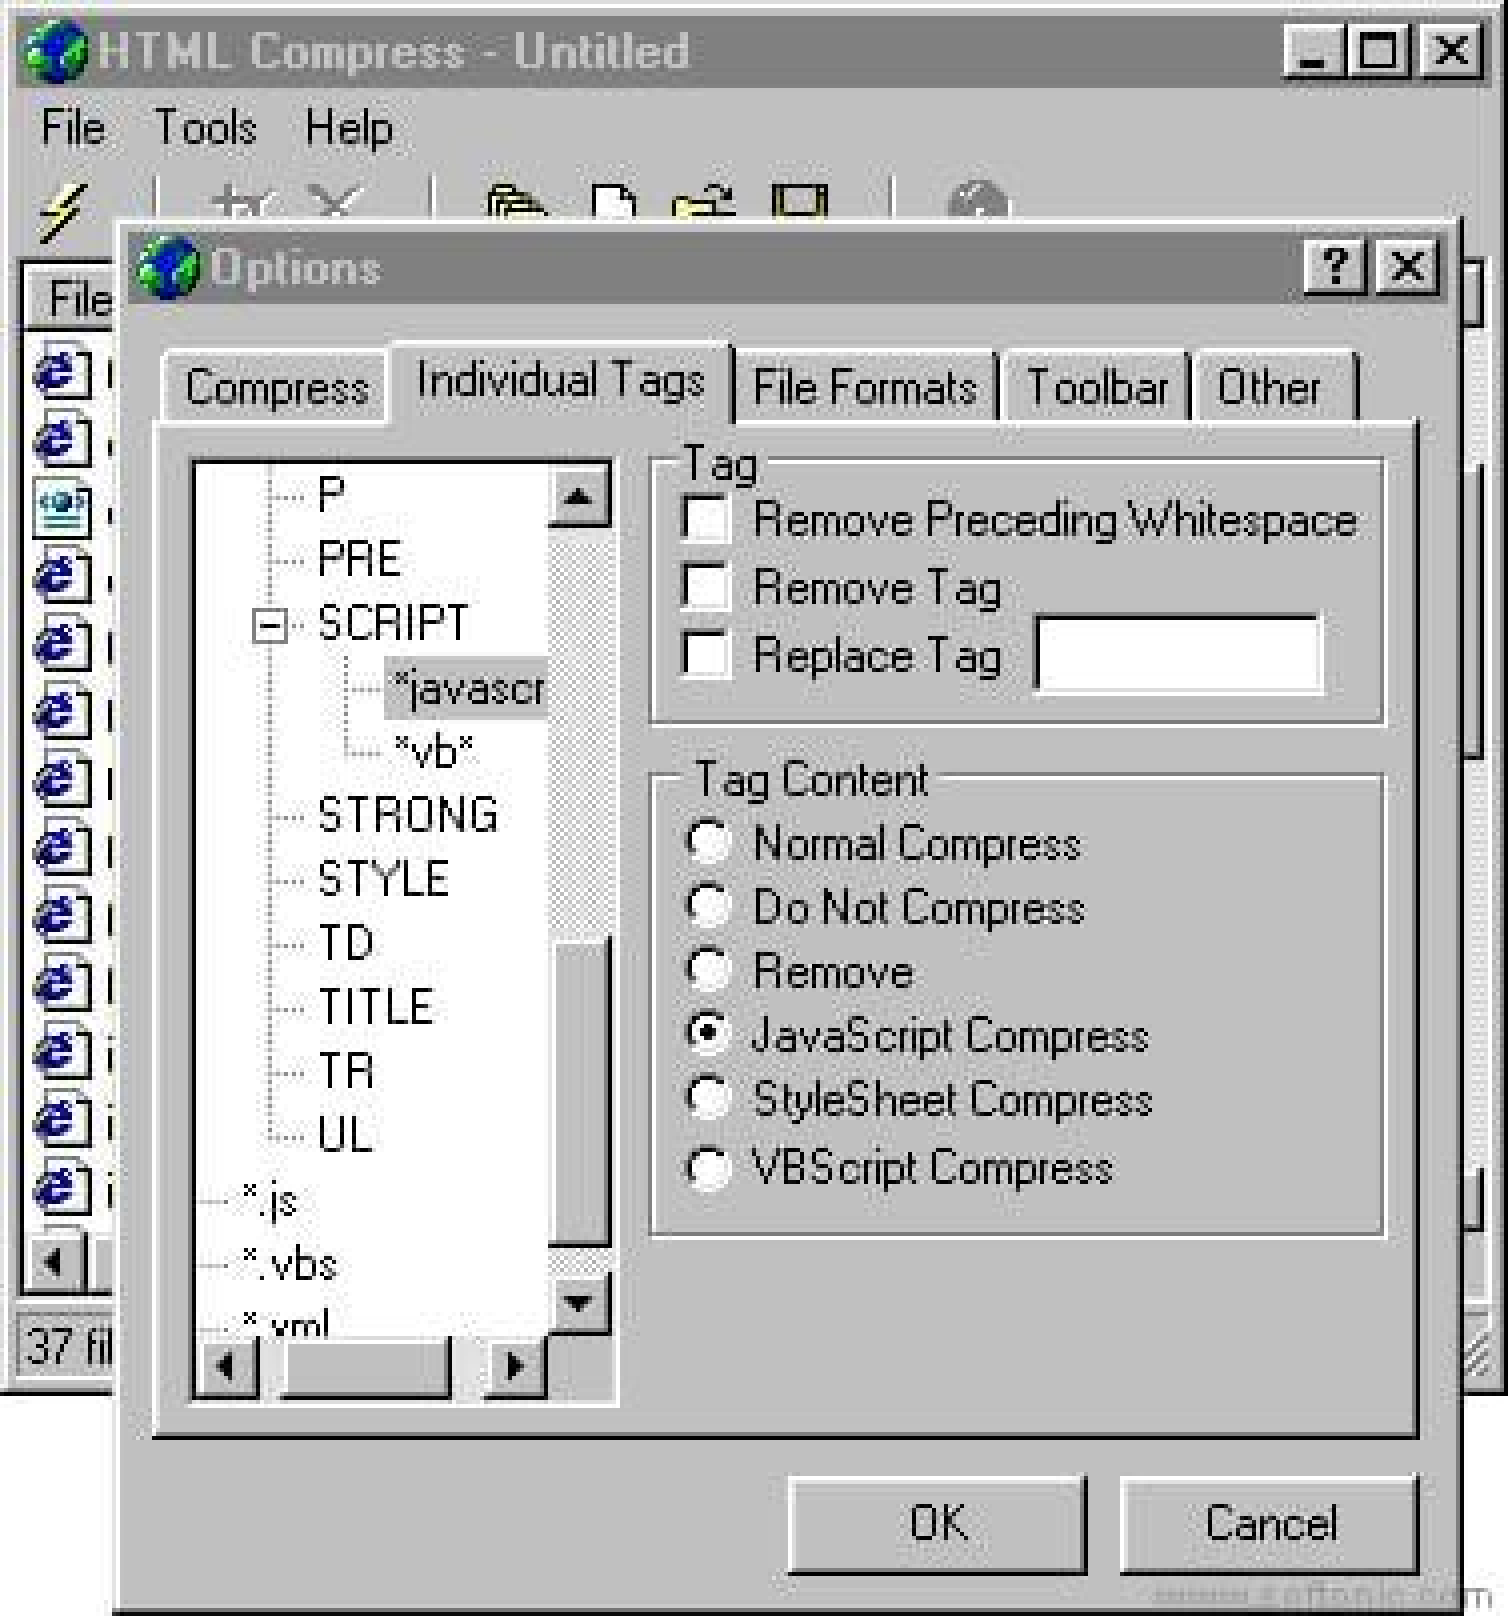 HTML Compress